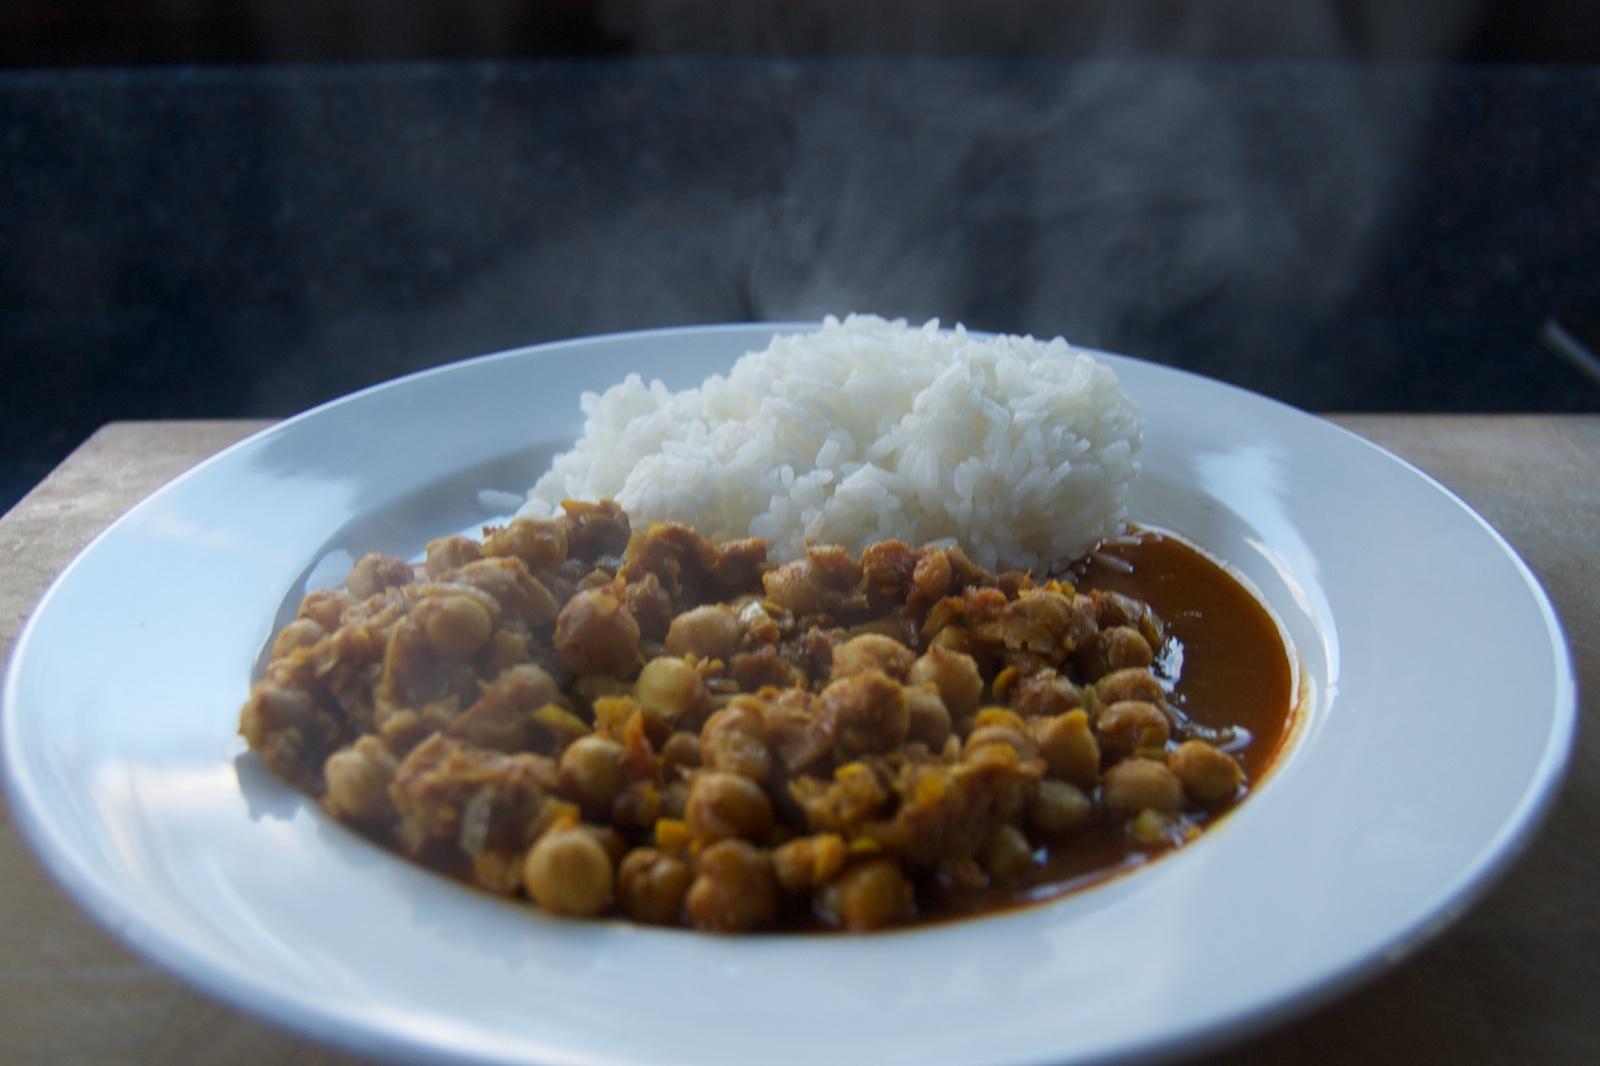 http://blog.rickk.com/food/2014/11/19/ate.2014.11.18.d.jpg